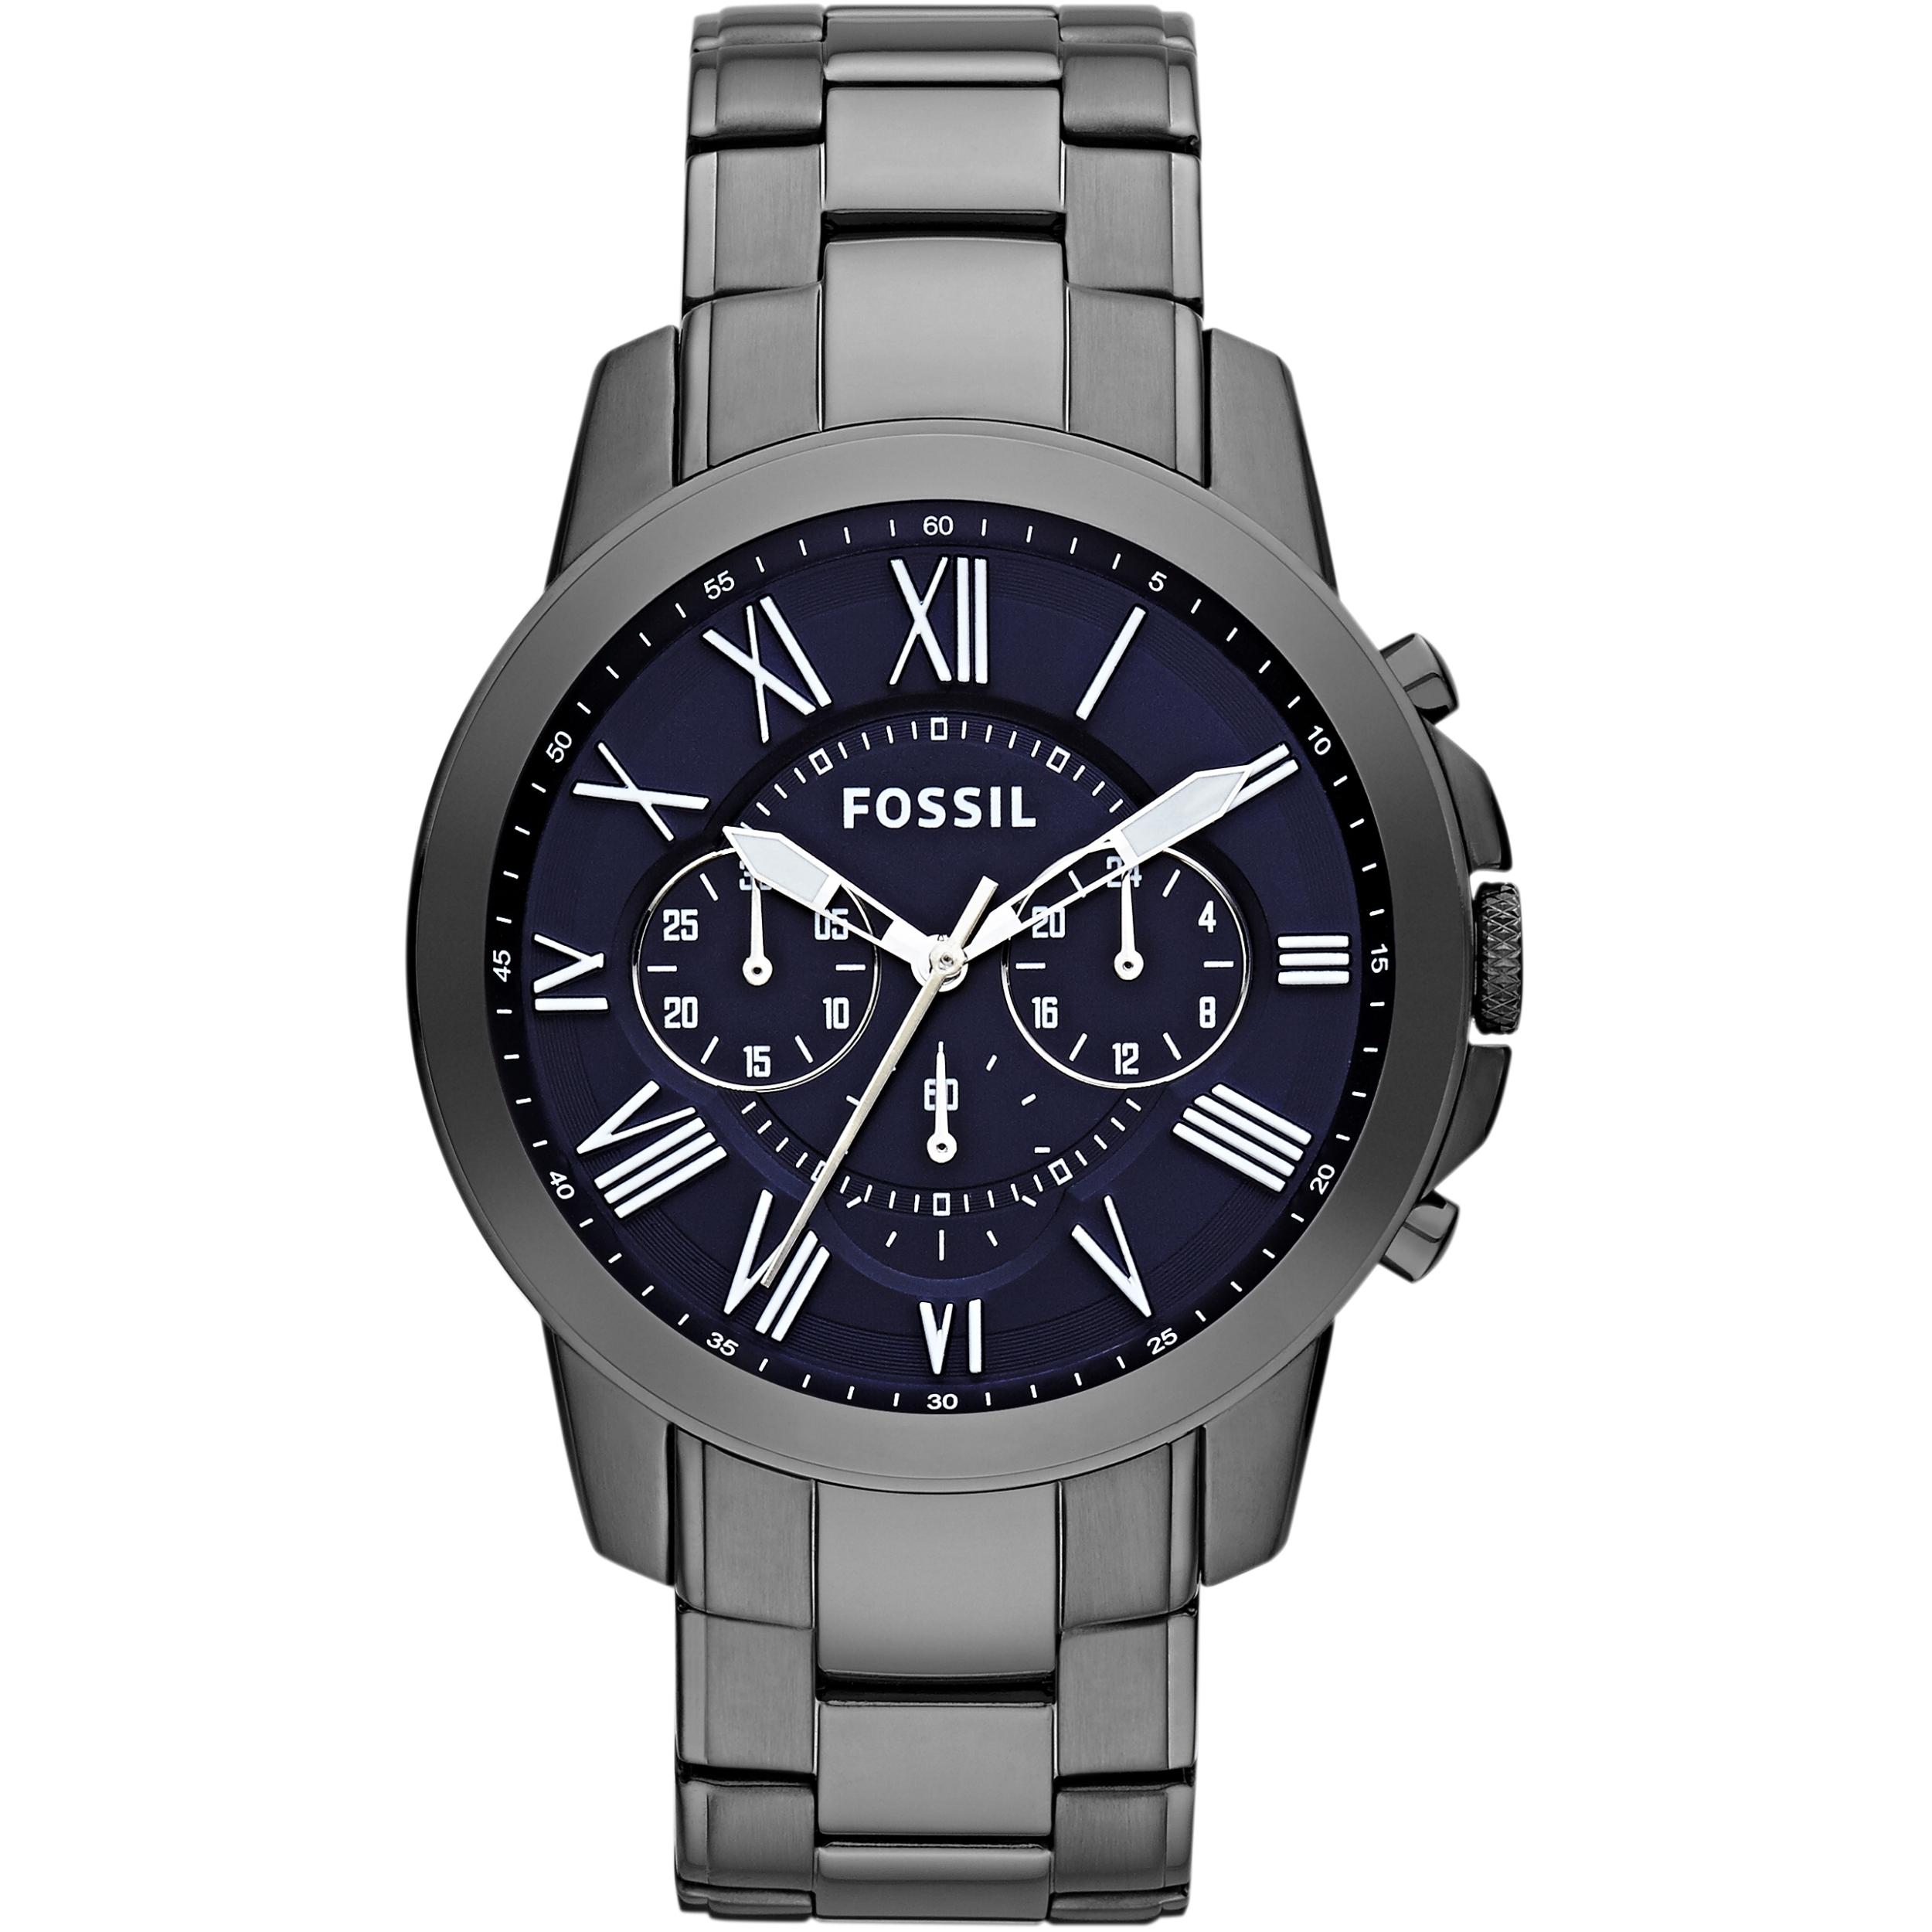 Gents Fossil Grant Chronograph Watch Fs4831 Fs5068